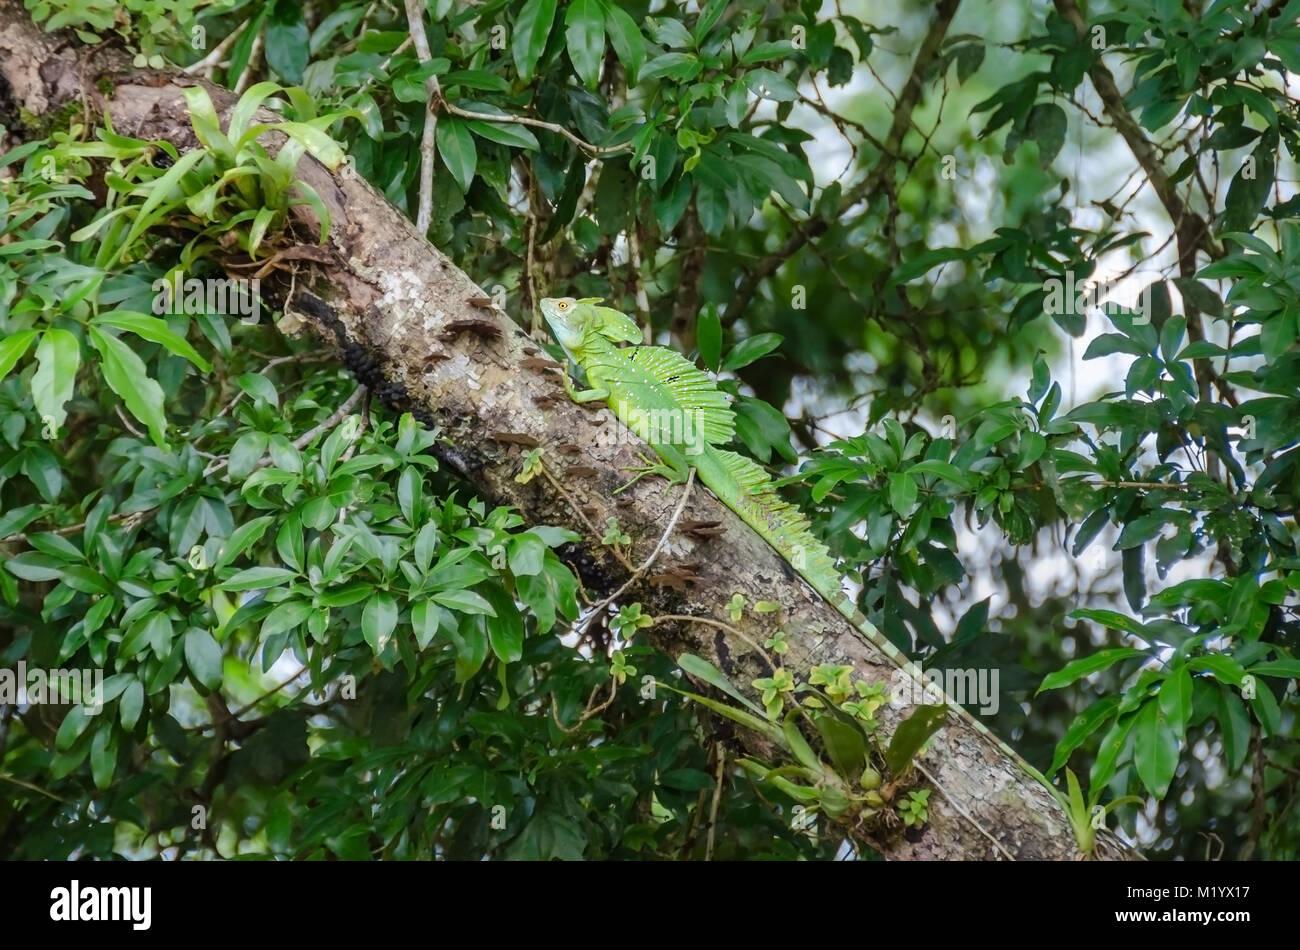 Plumed basilisk (Basiliscus plumifrons), also known as green basilisk, double crested basilisk, or Jesus Christ Stock Photo